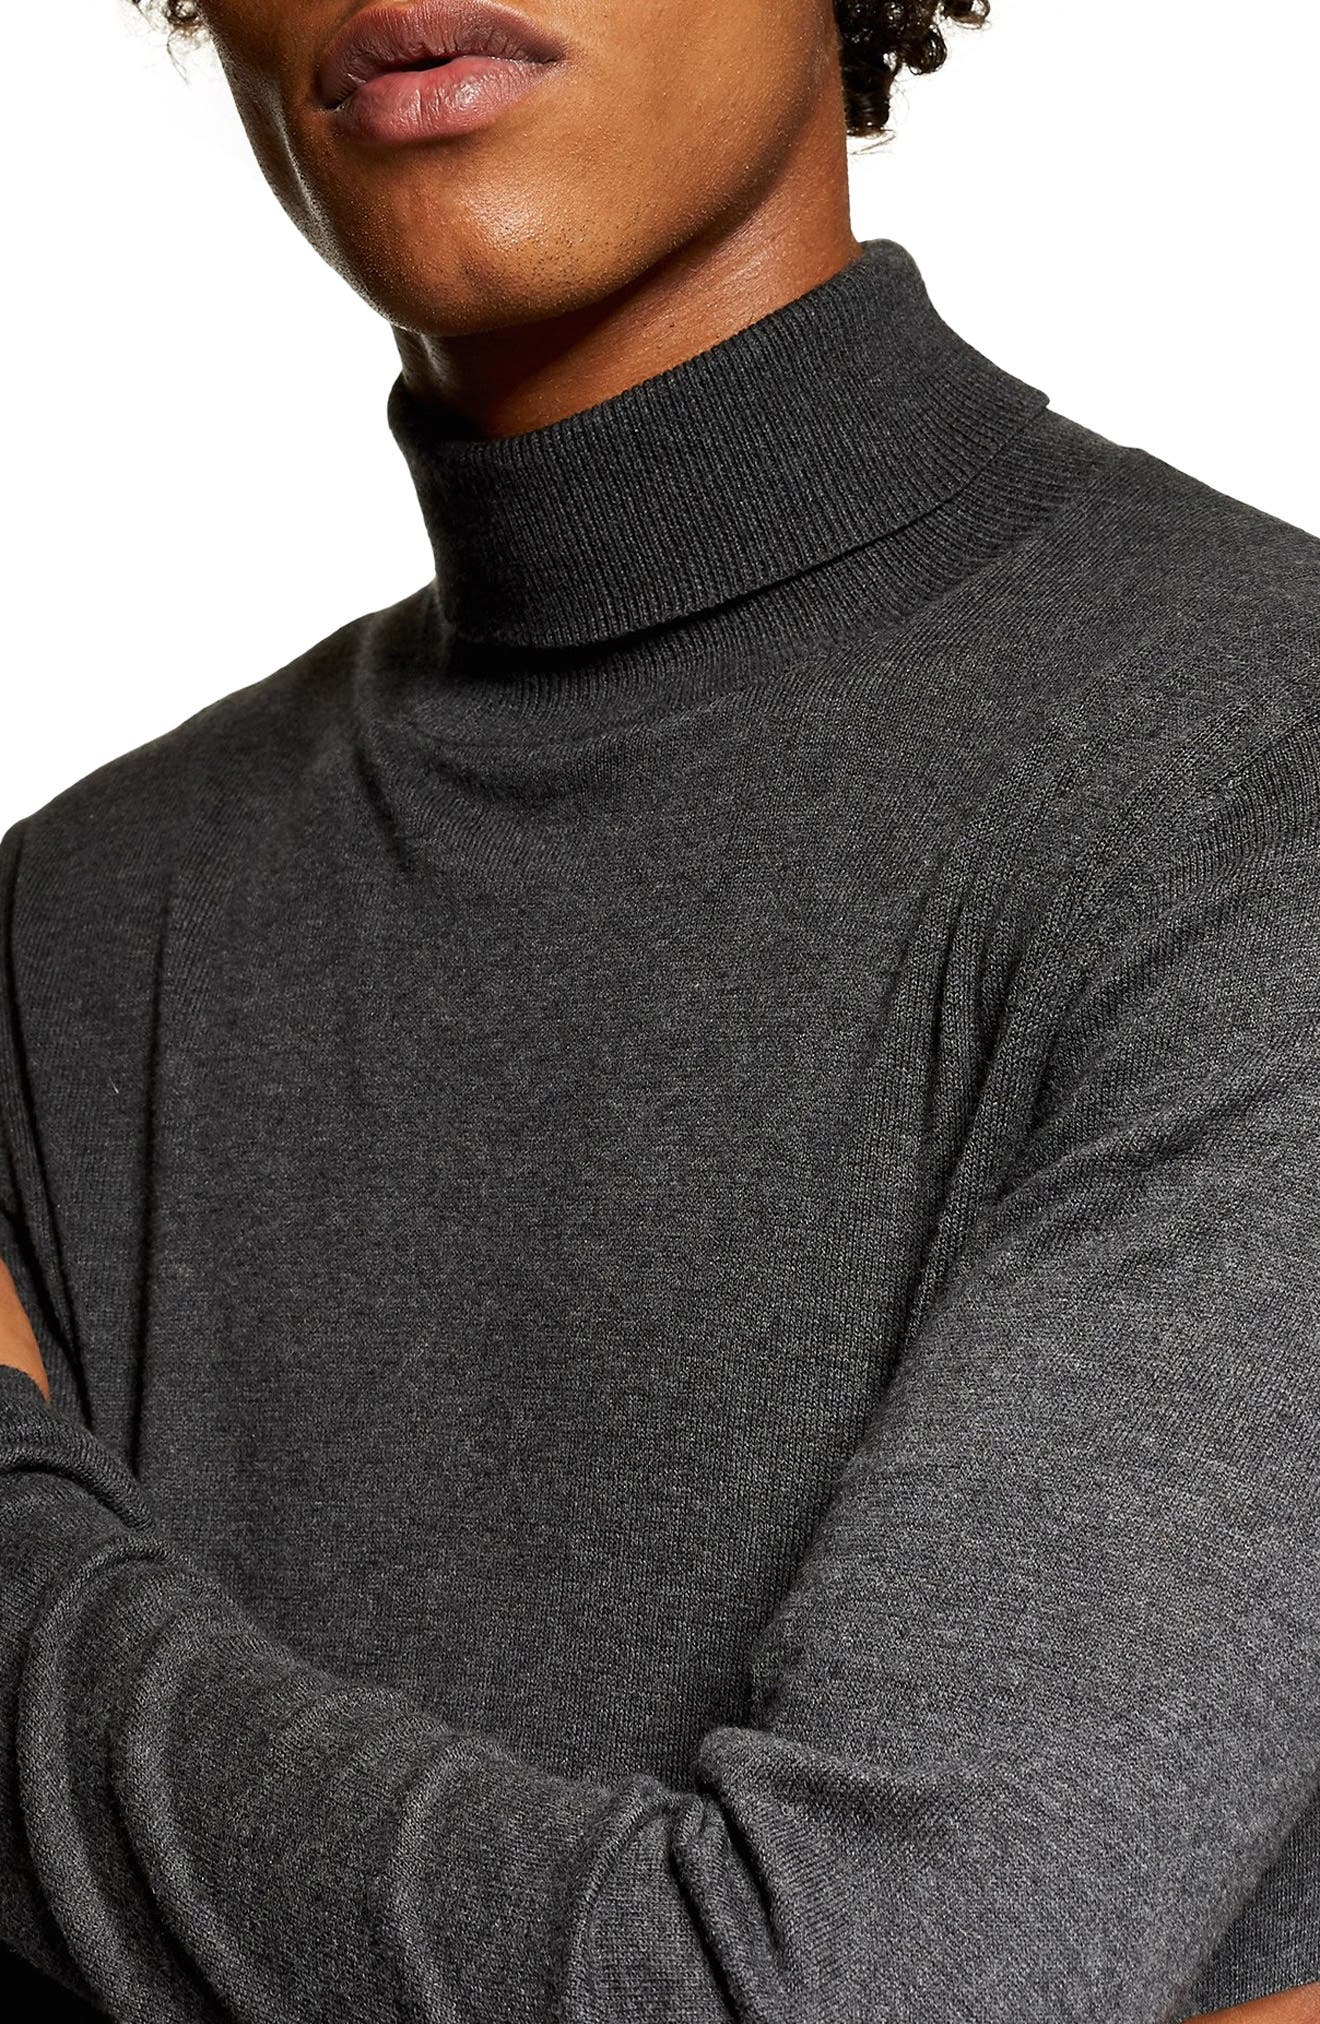 Classic Fit Turtleneck Sweater,                             Alternate thumbnail 3, color,                             DARK GREY